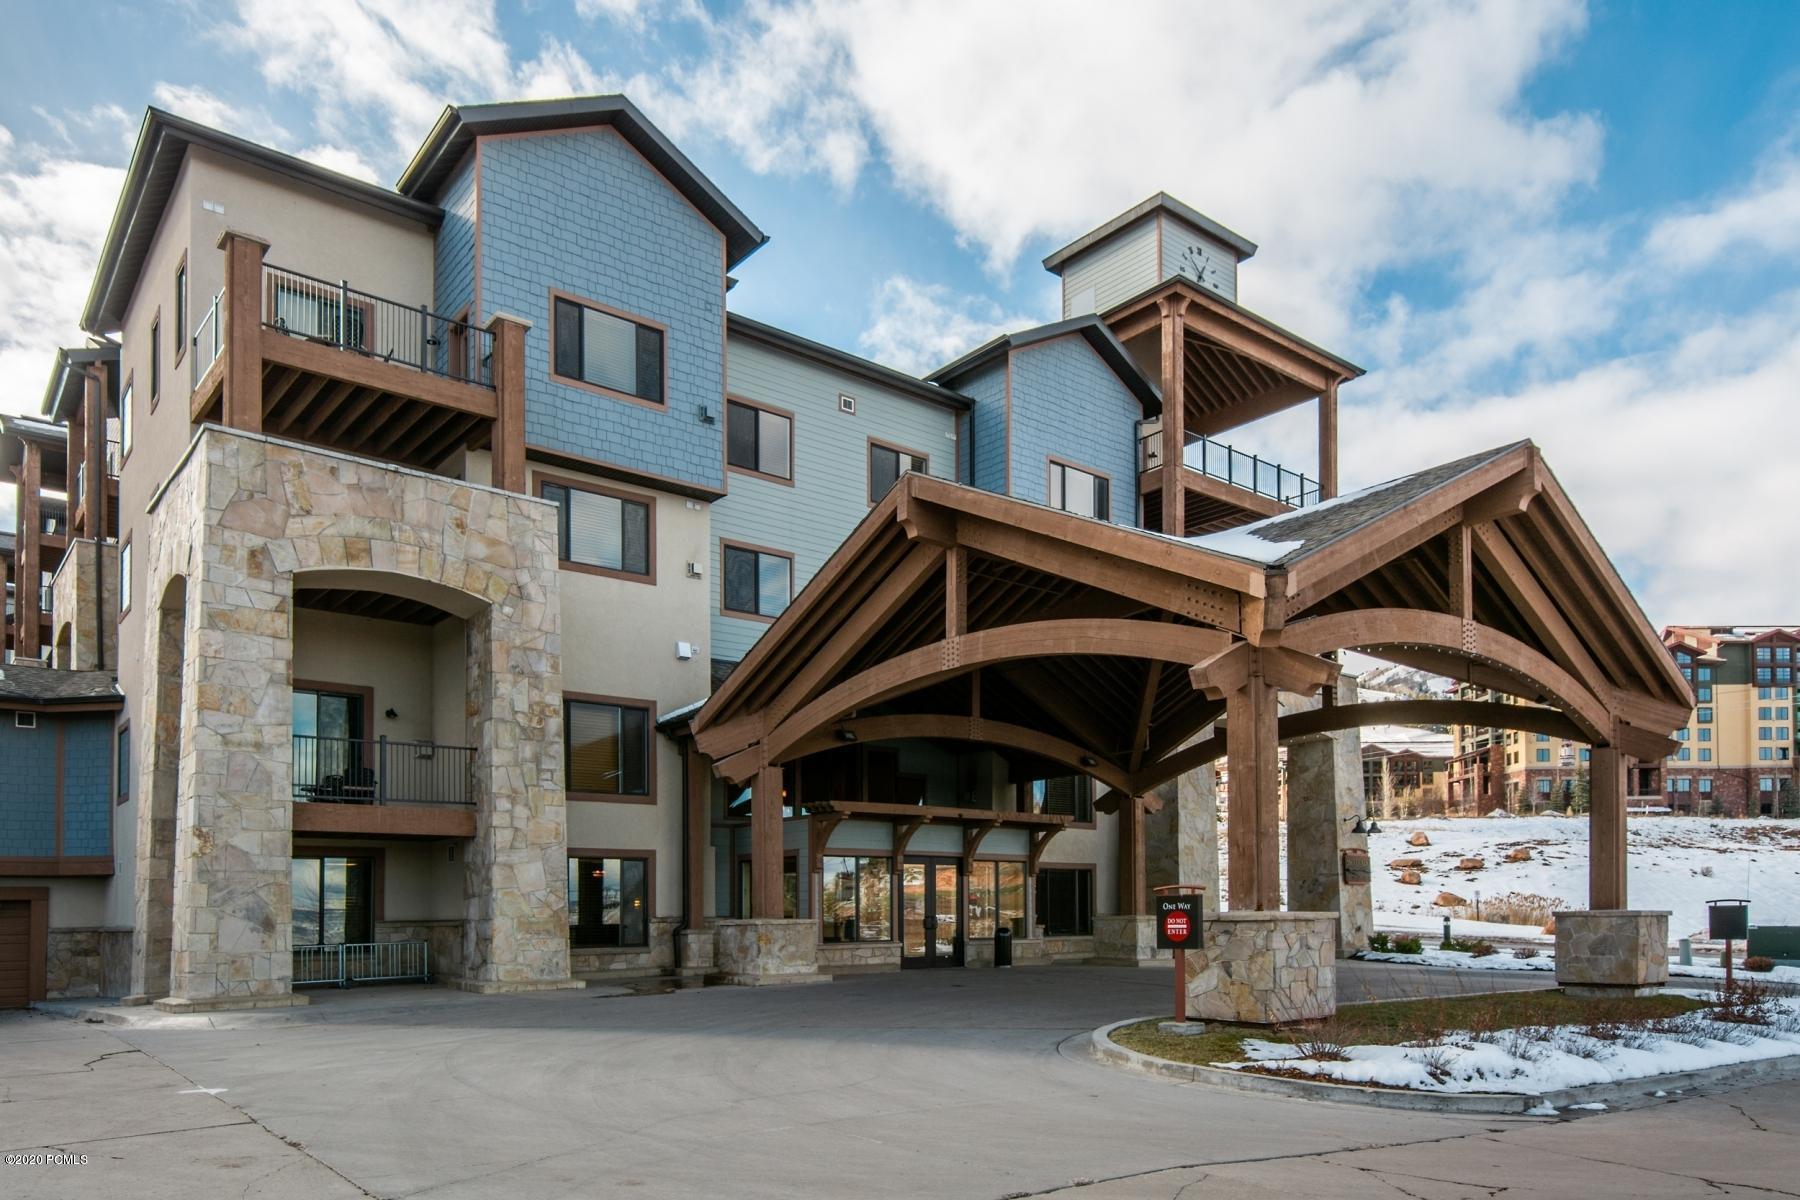 2653 Canyons Resort Drive, Park City, Utah 84098, ,1 BathroomBathrooms,Condominium,For Sale,Canyons Resort,12004053